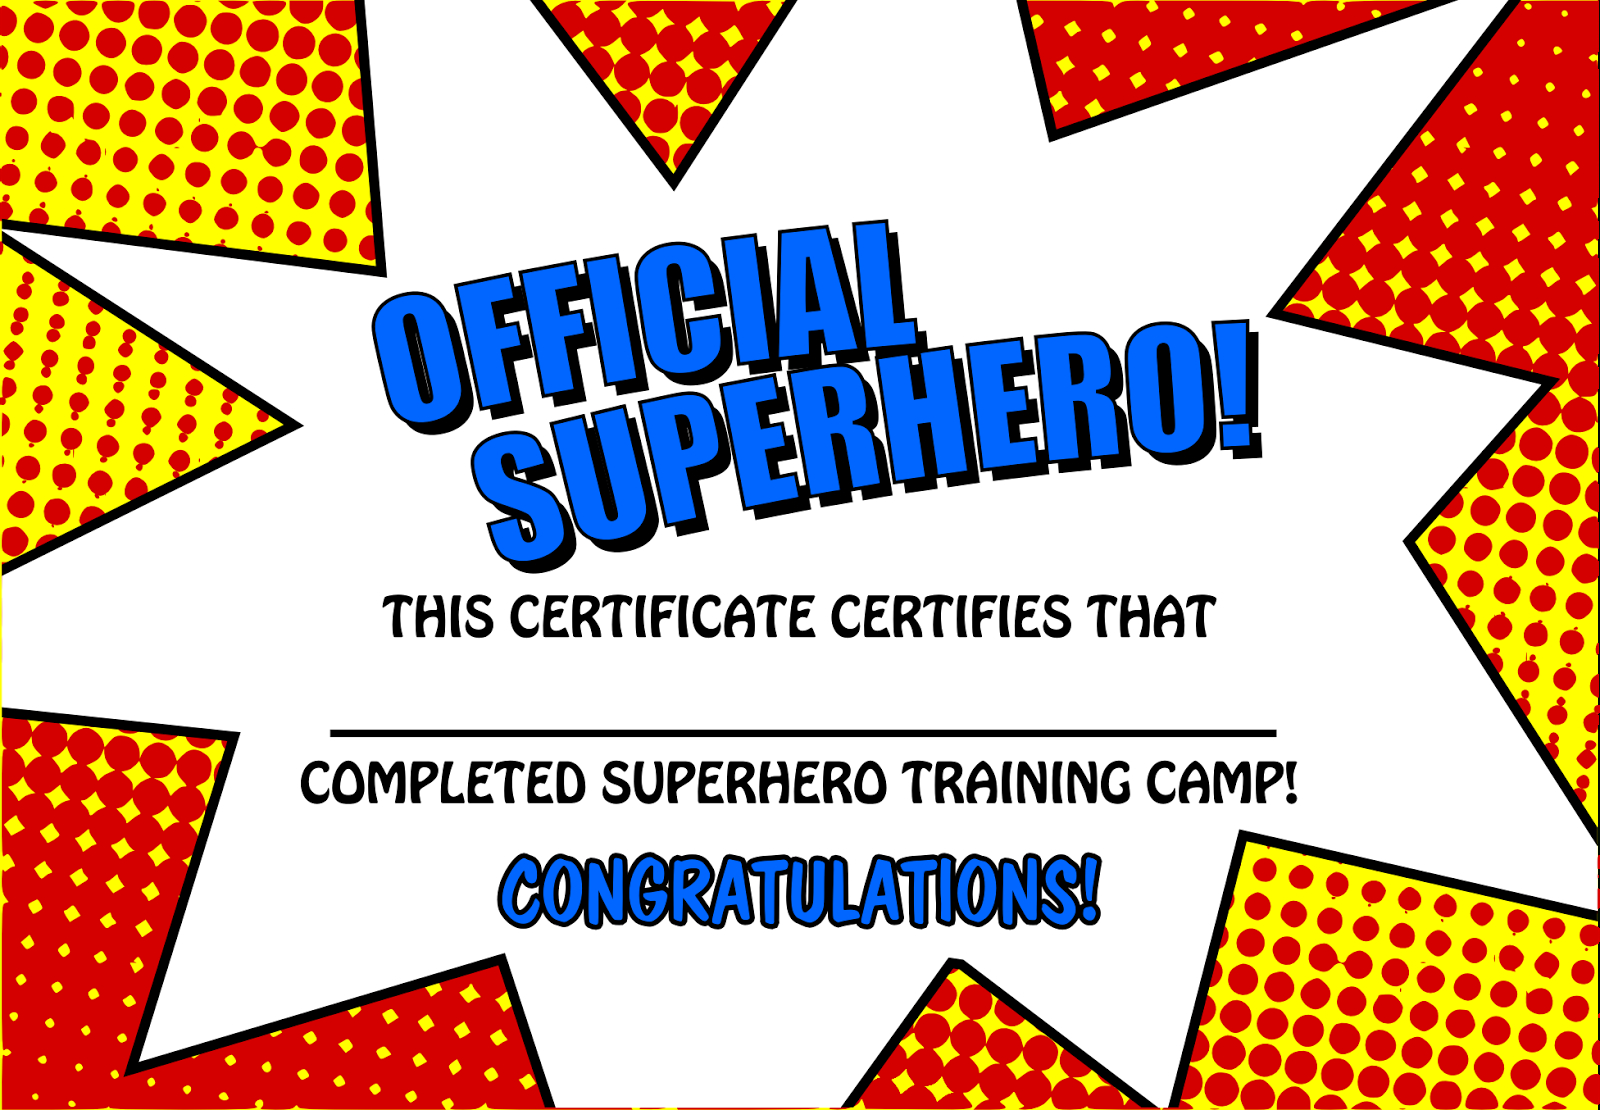 Pincrafty Annabelle On Super Heros Printables | Superhero Party - Free Printable Superhero Certificates